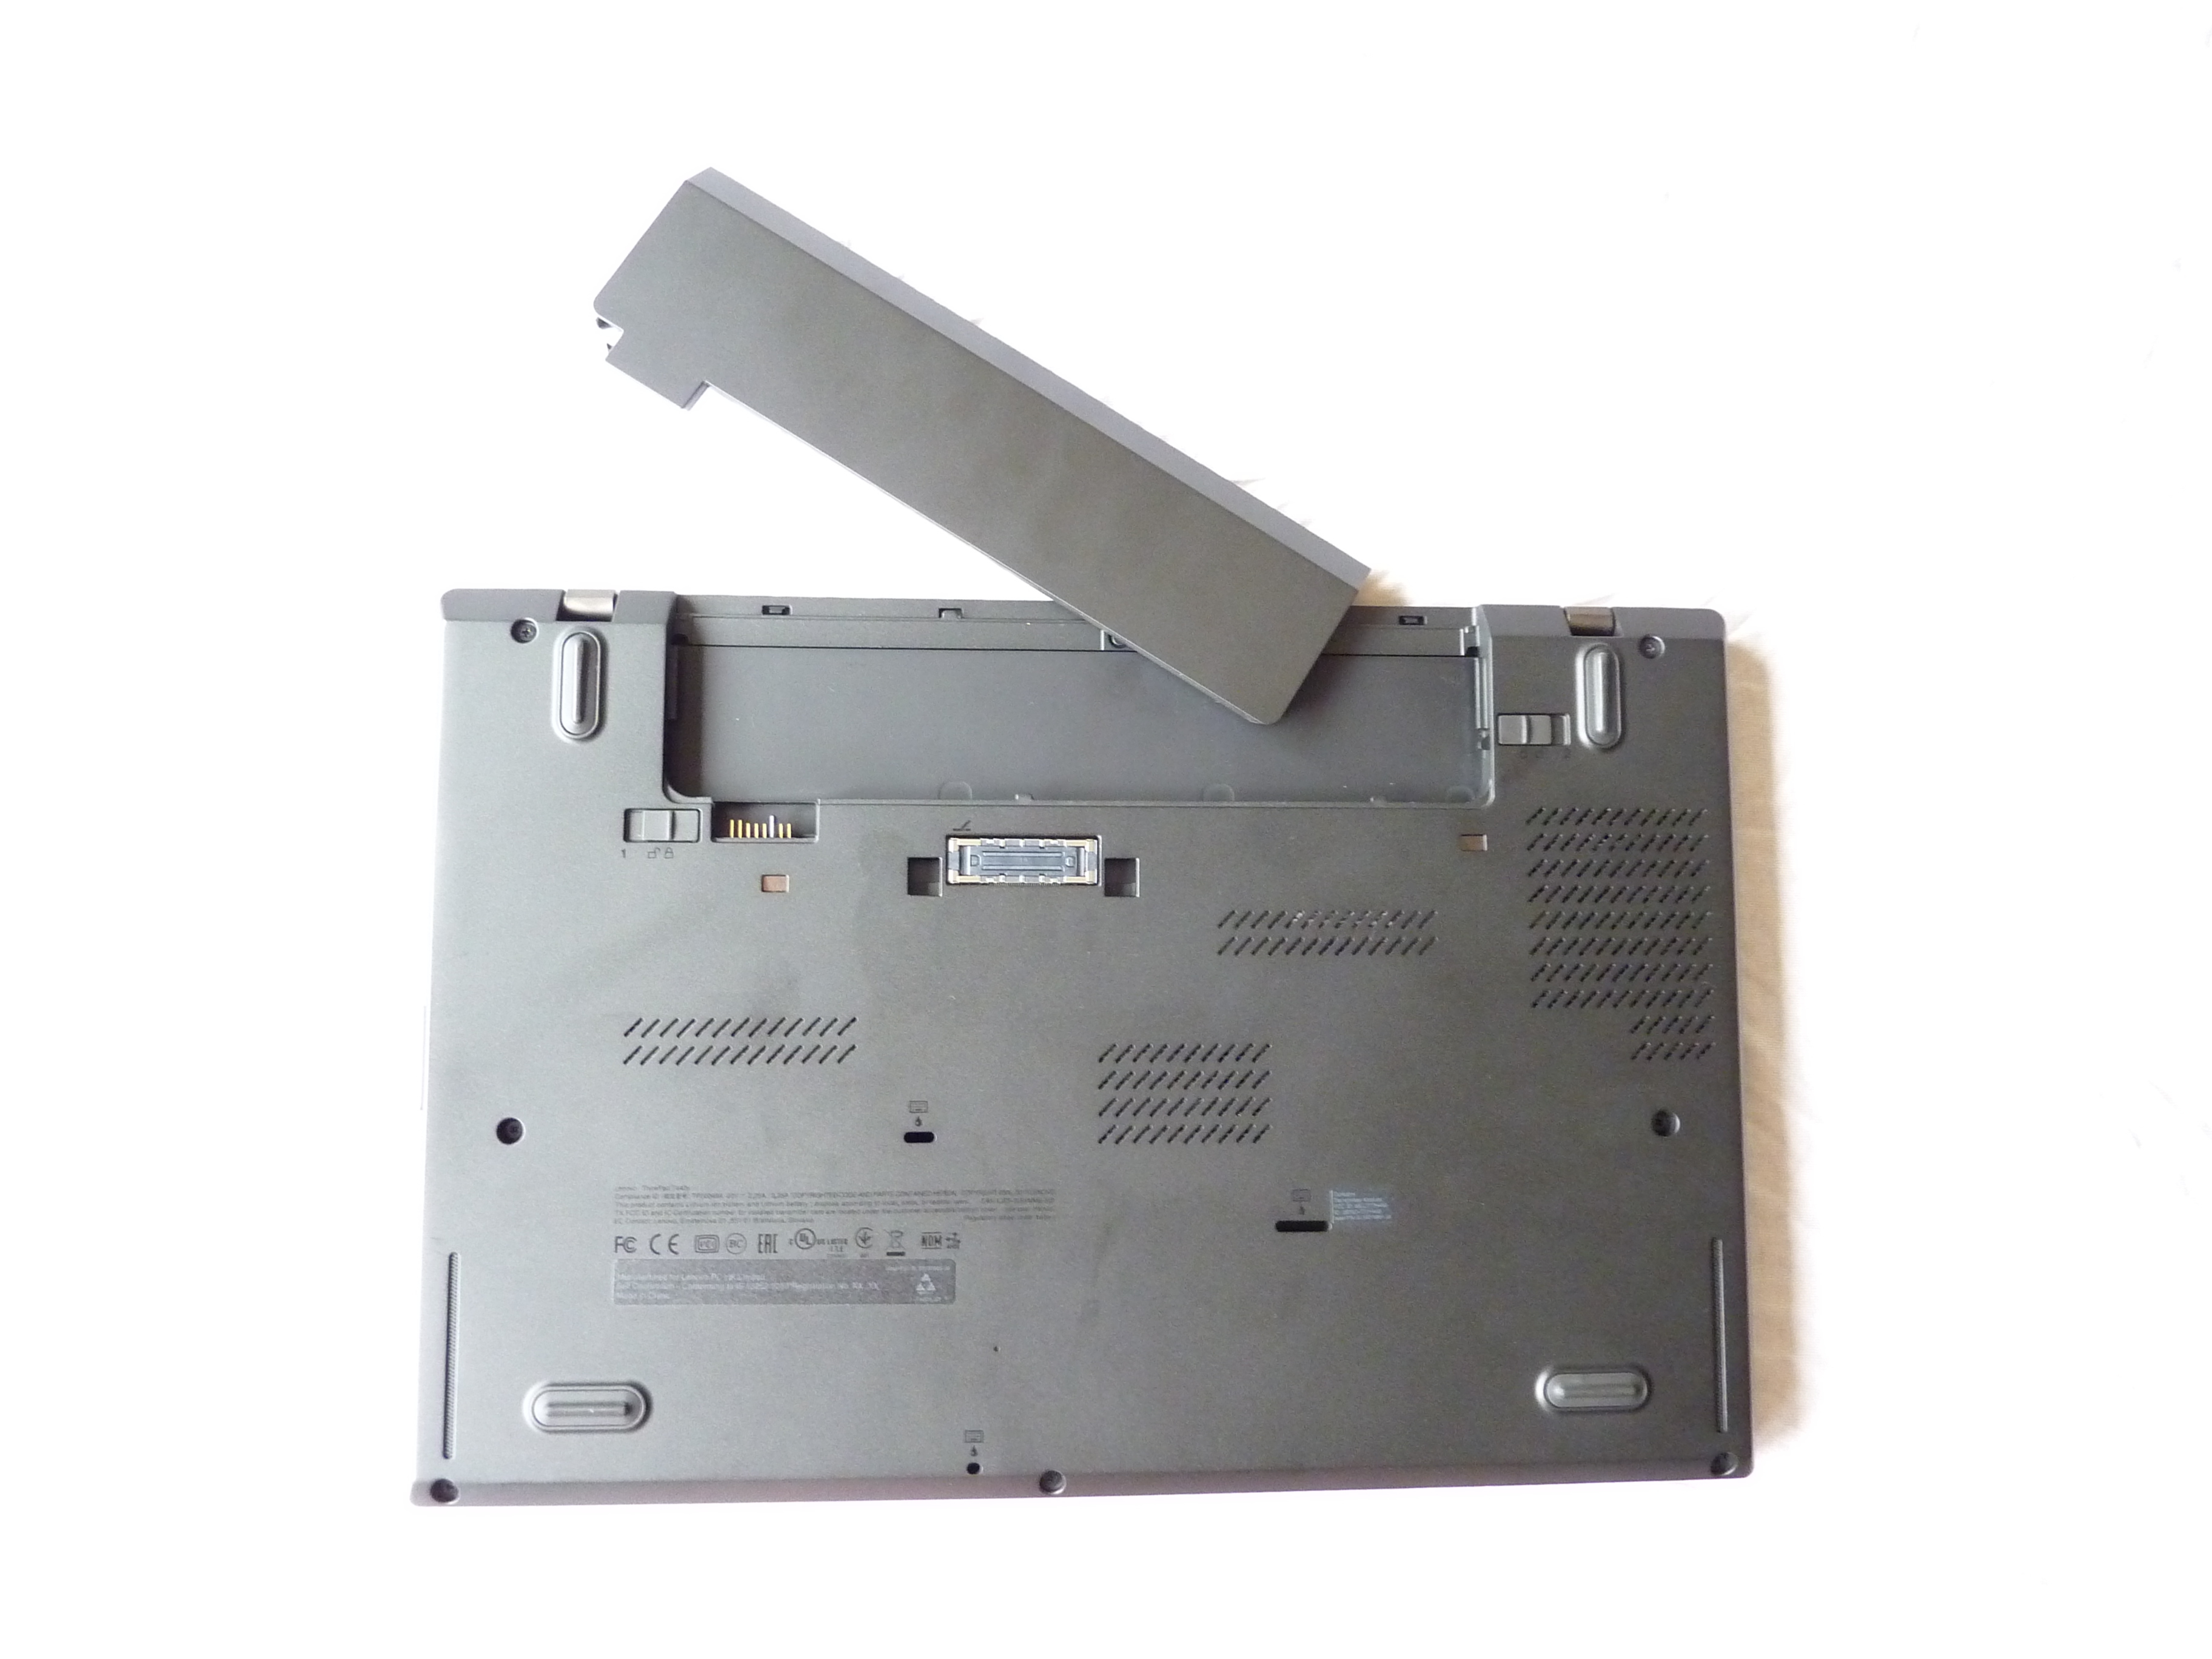 Lenovo Thinkpad T440s Repair - iFixit